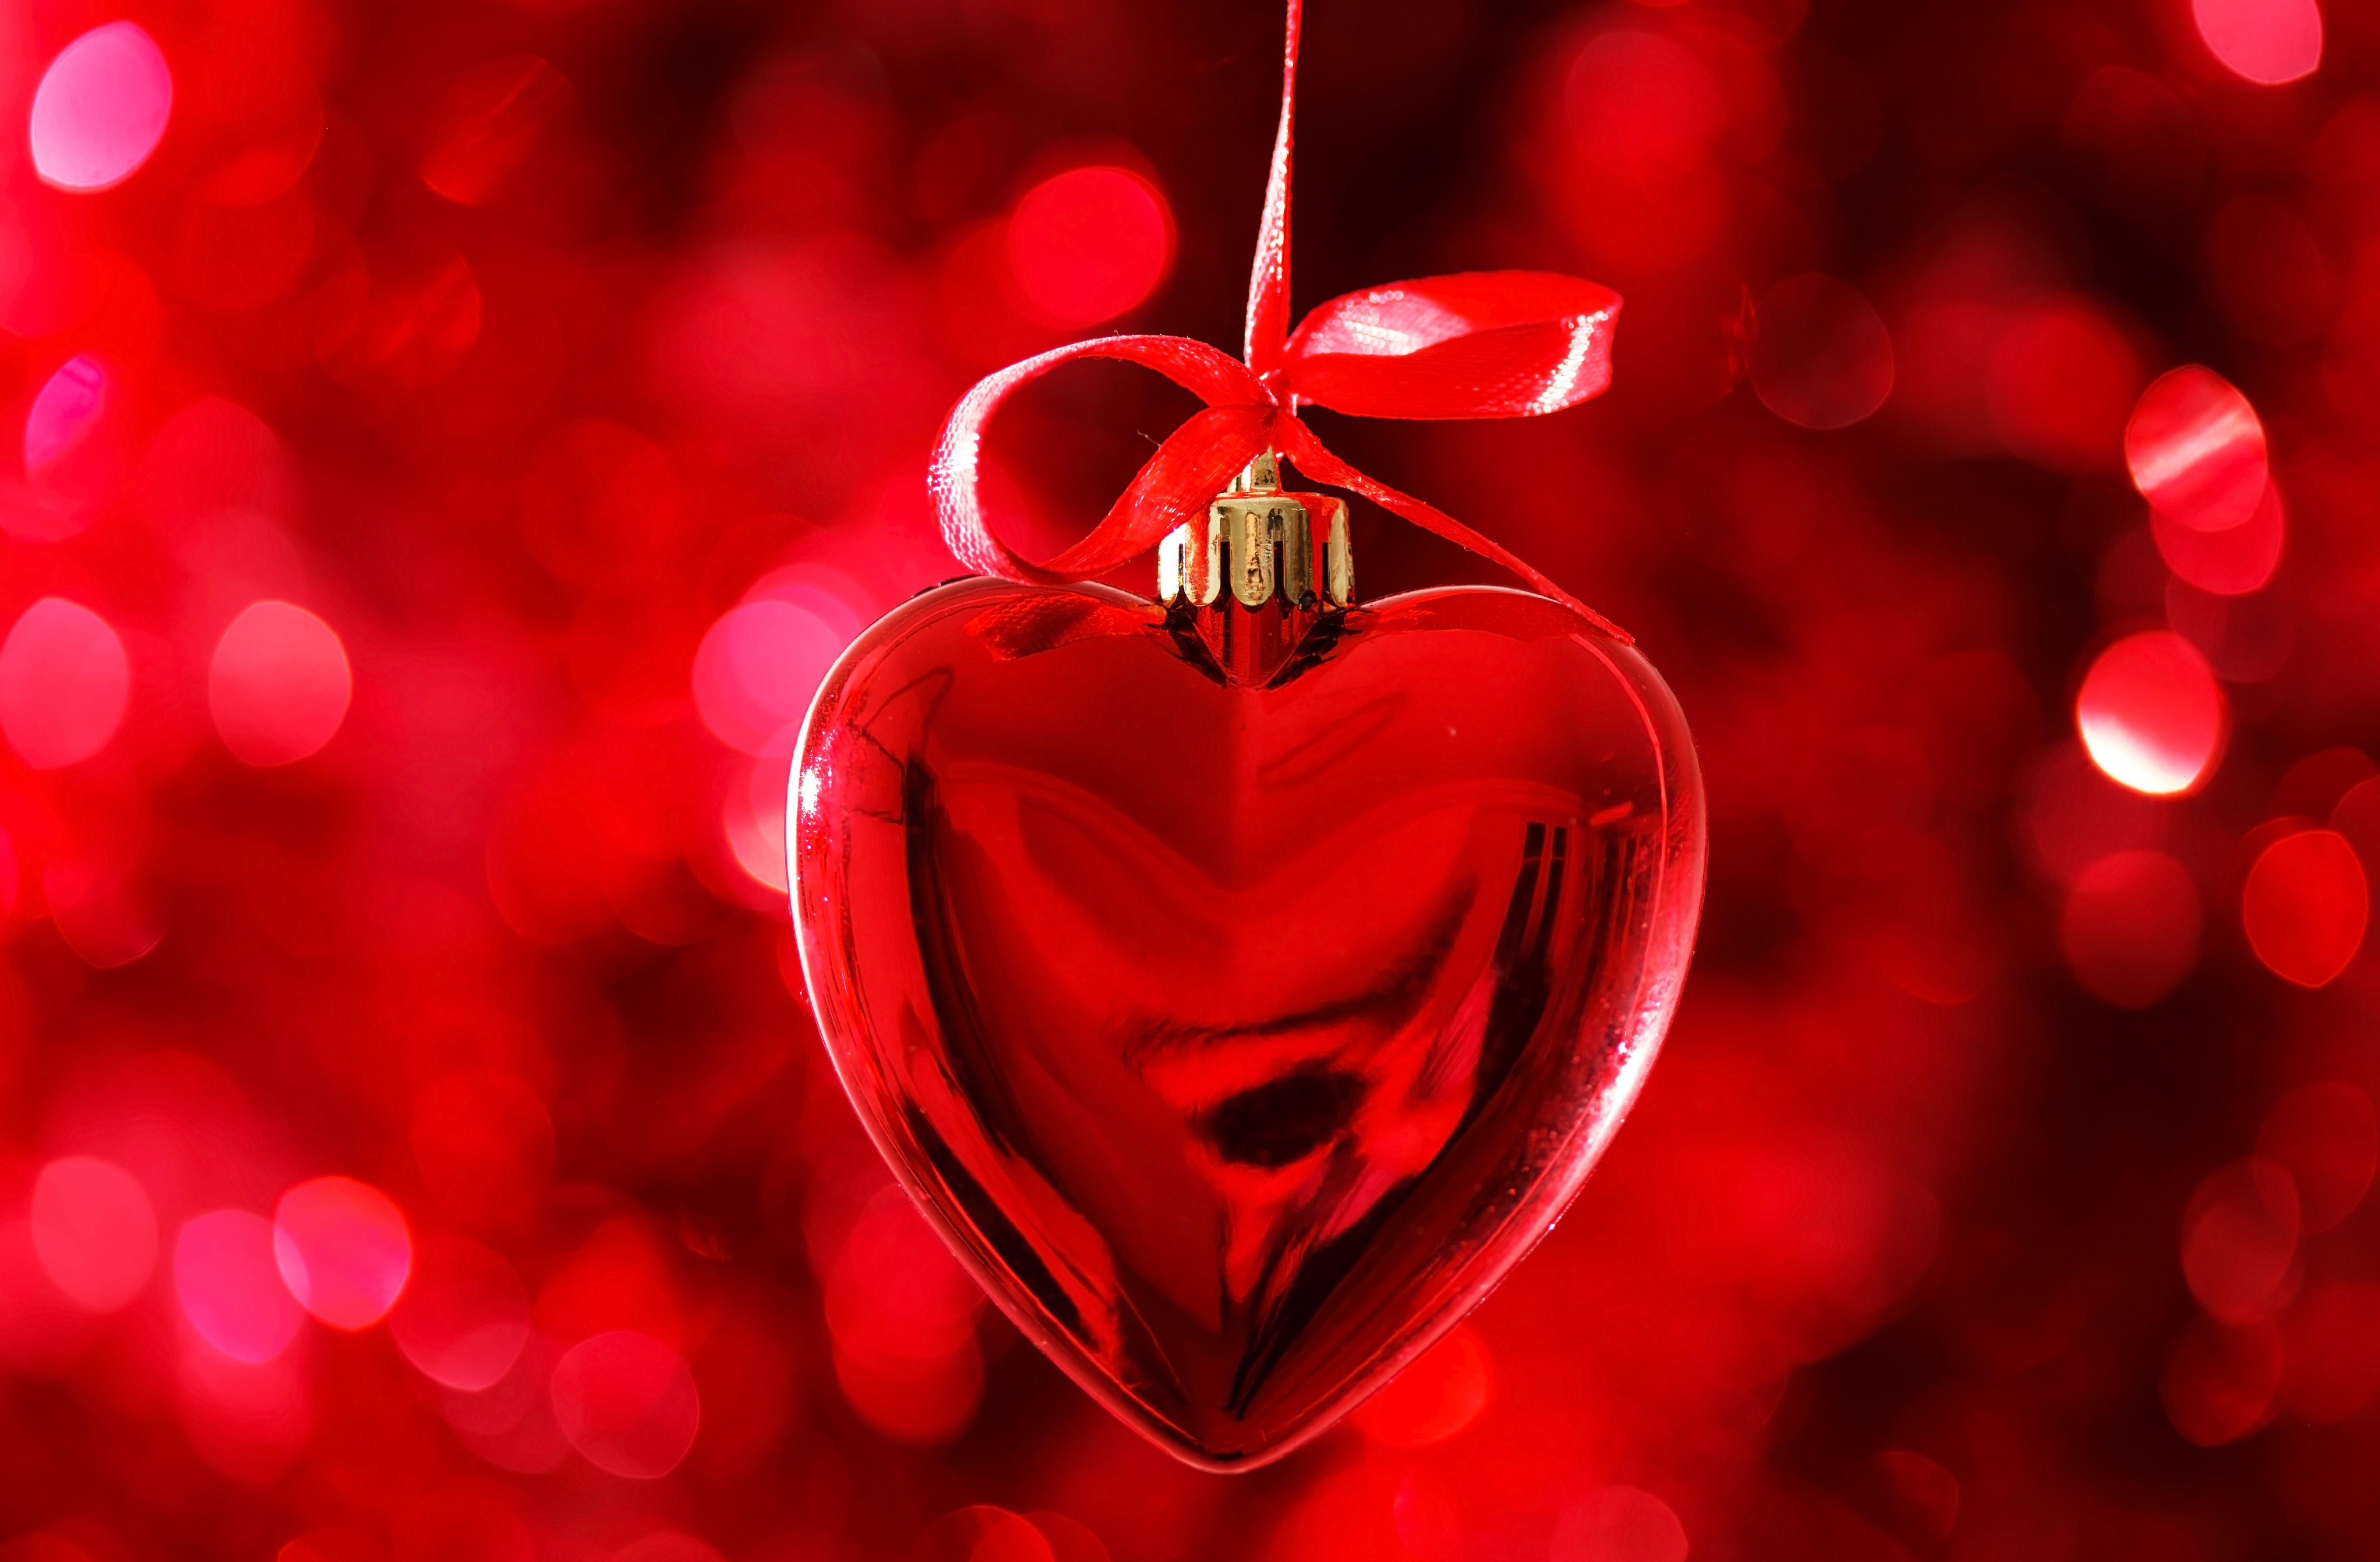 love love wallpaper,red,heart,christmas ornament,valentine's day,love